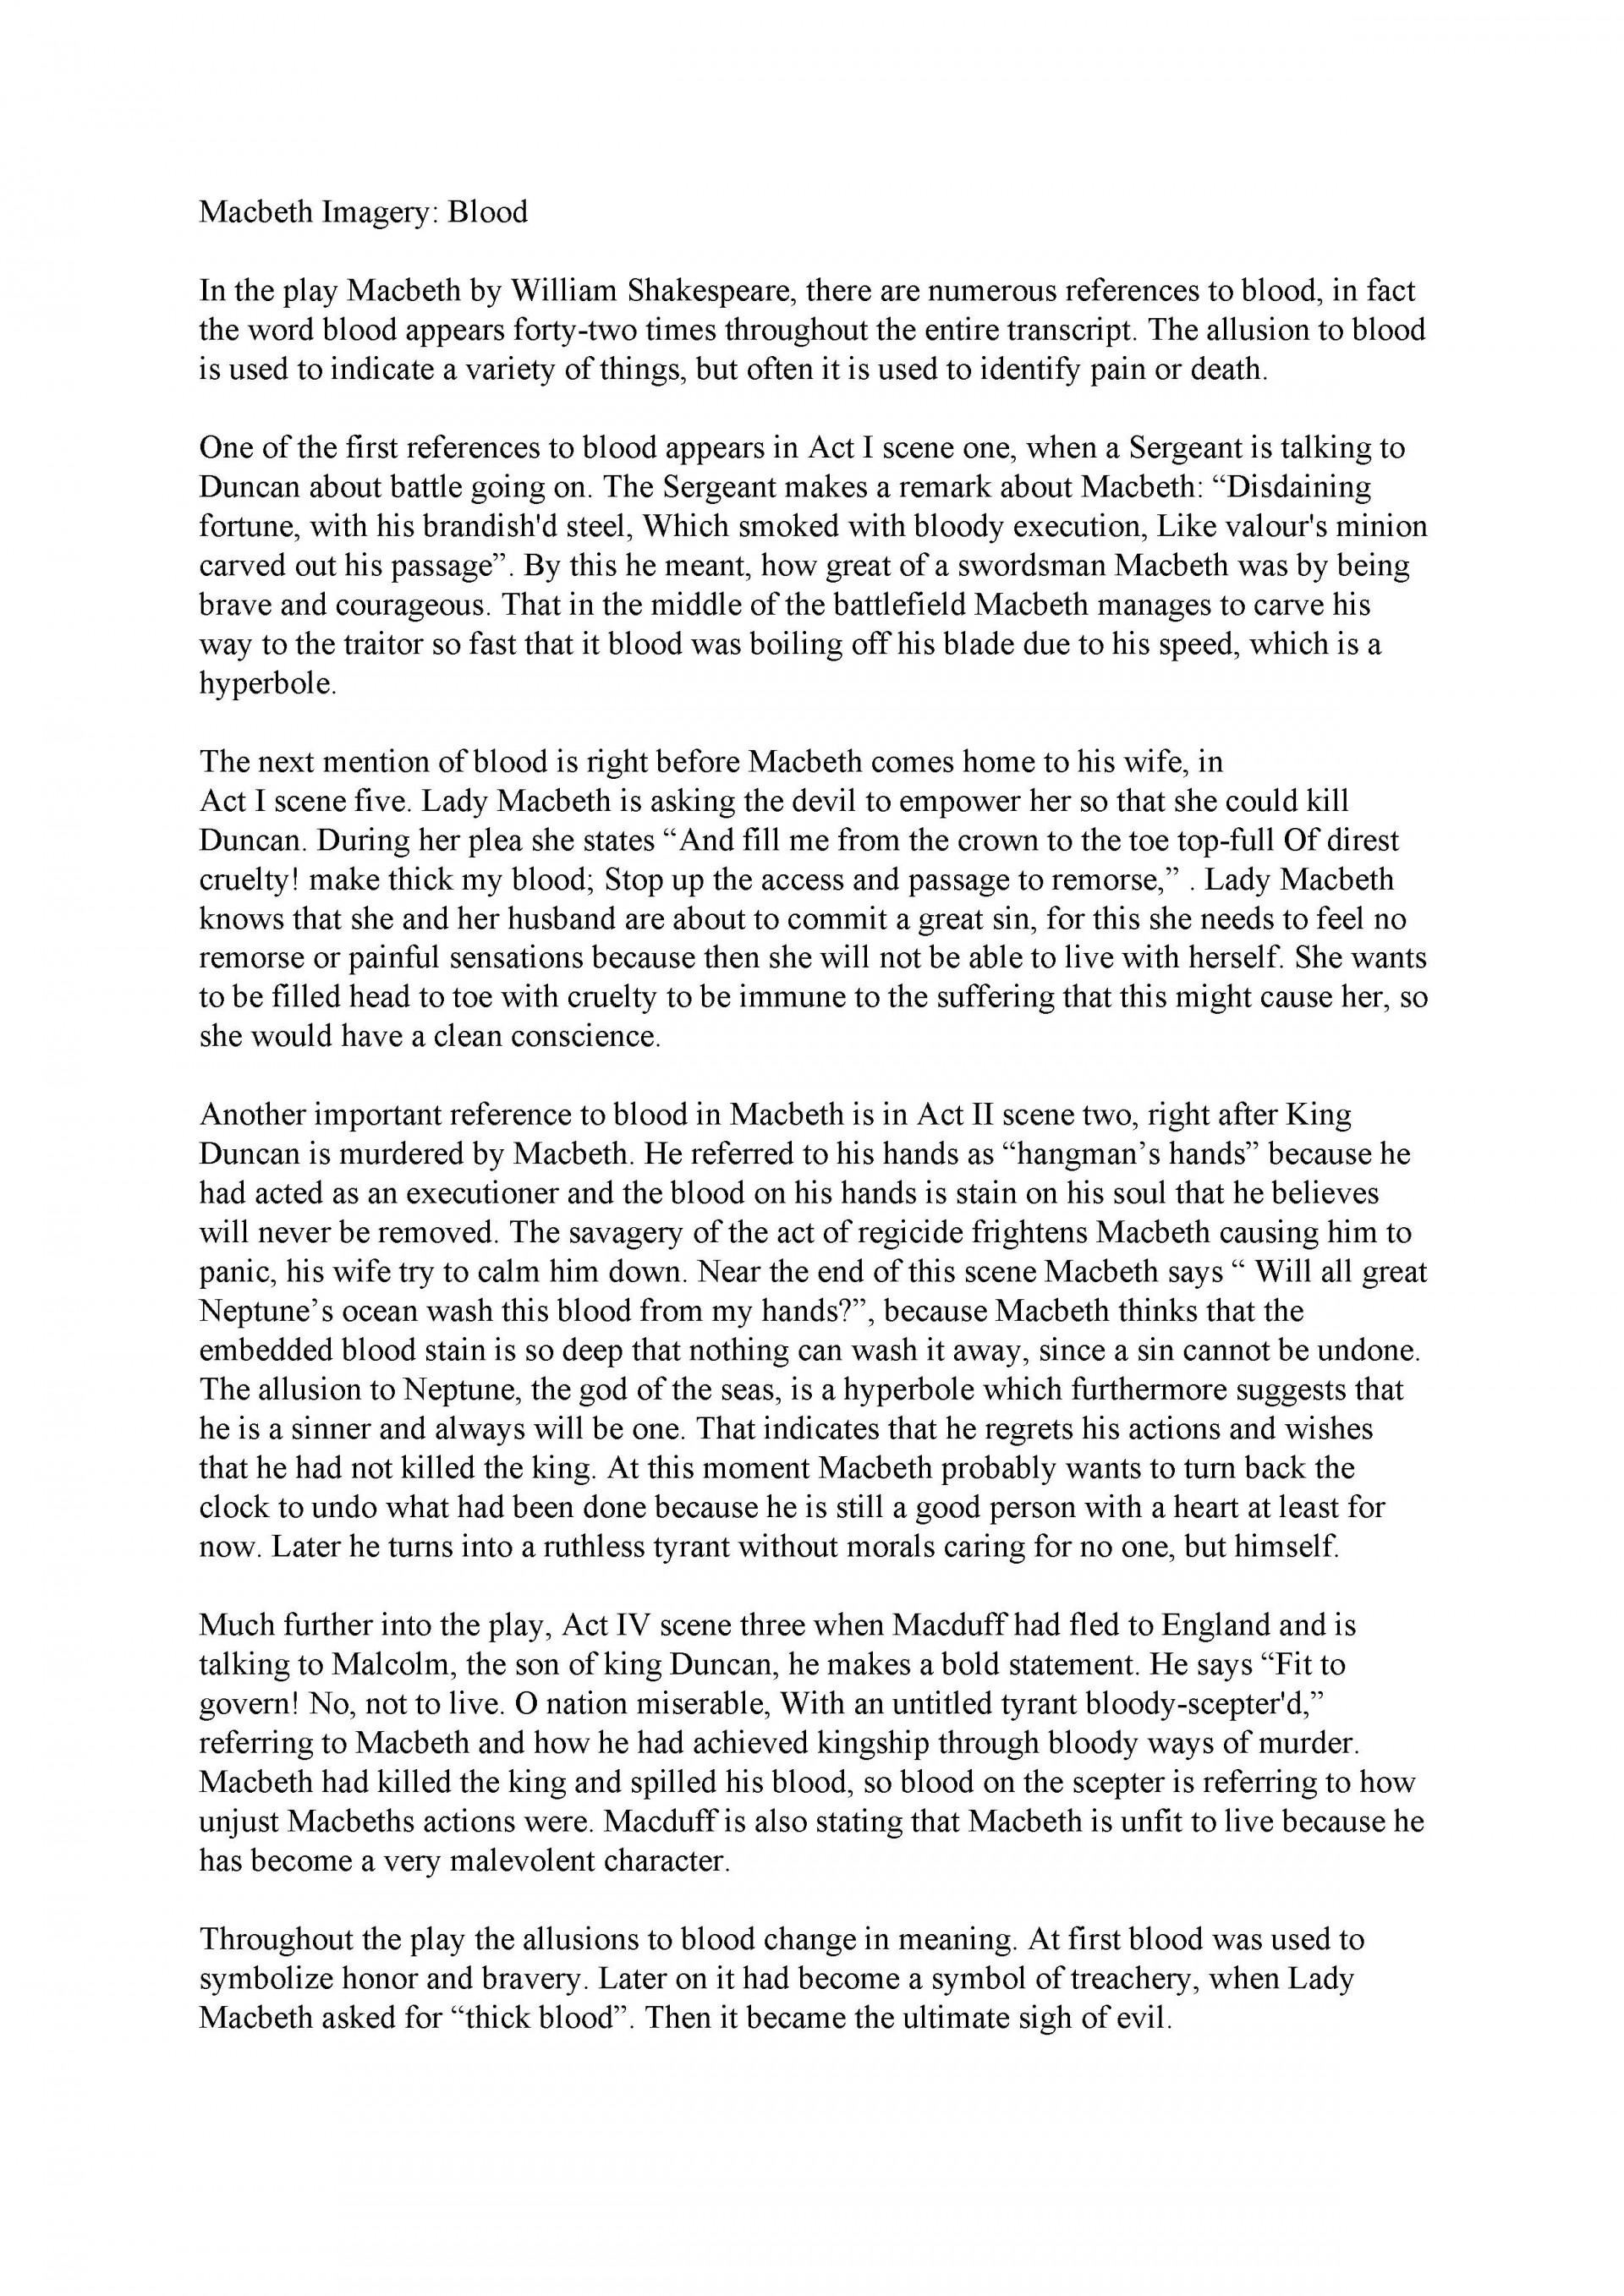 004 Macbeth Essay Sample Essayss Striking Essays Examples Tagalog Argumentative Pdf Samples 1920